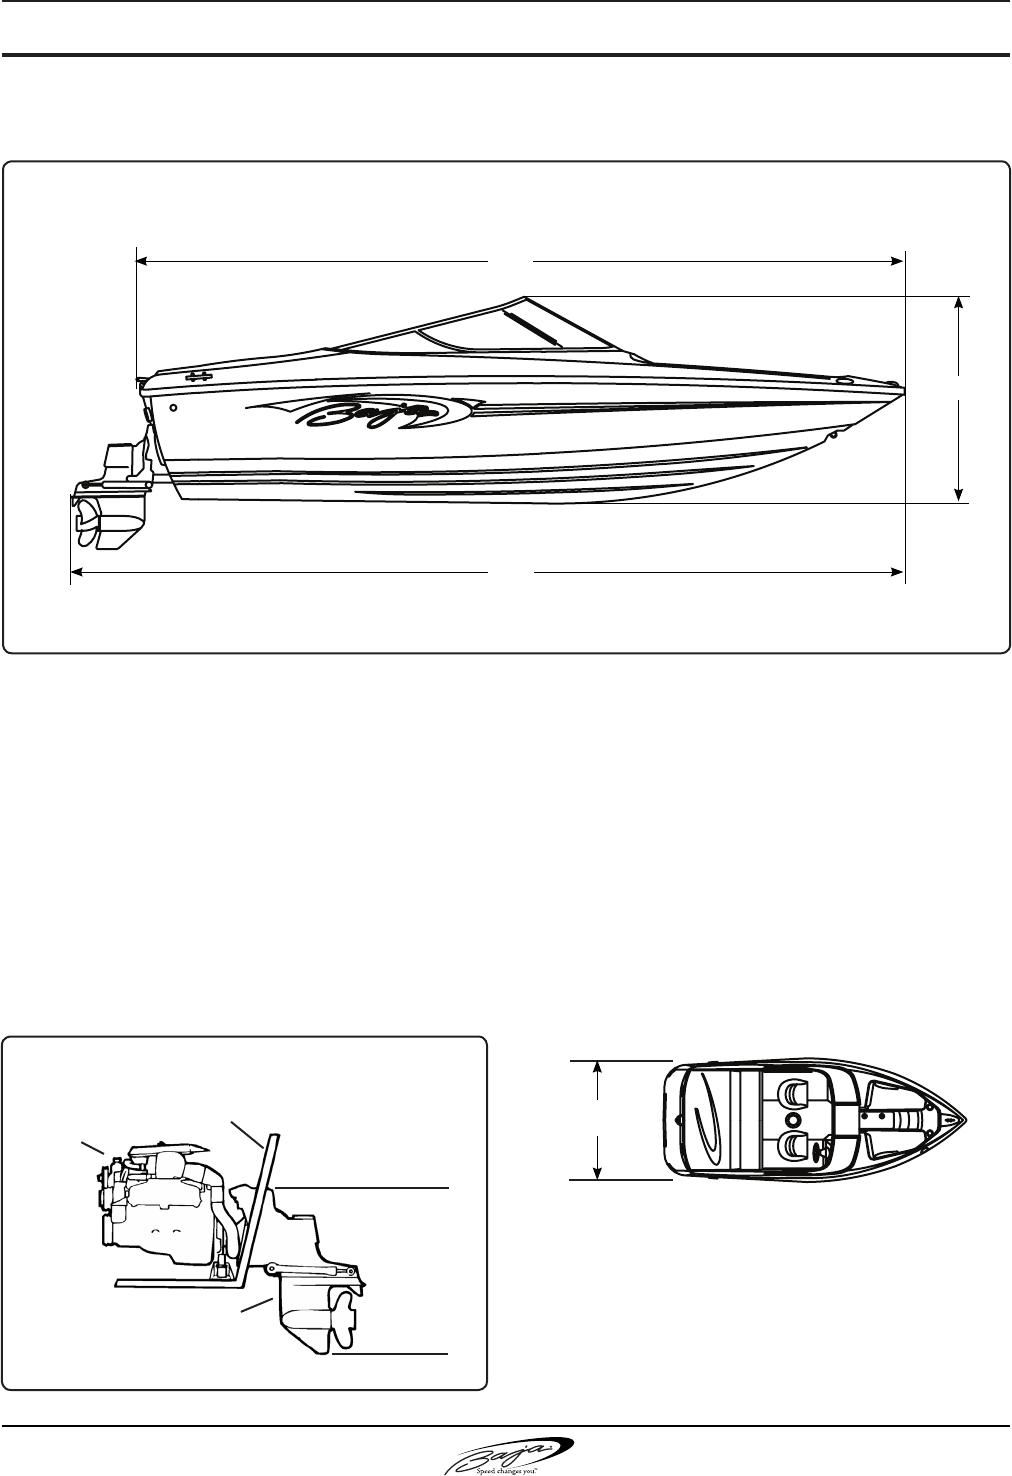 Wiring Diagram For Baja Islander Anchor Light Great Design Of Fast Detailed Schematics Rh Antonartgallery Com Electronics